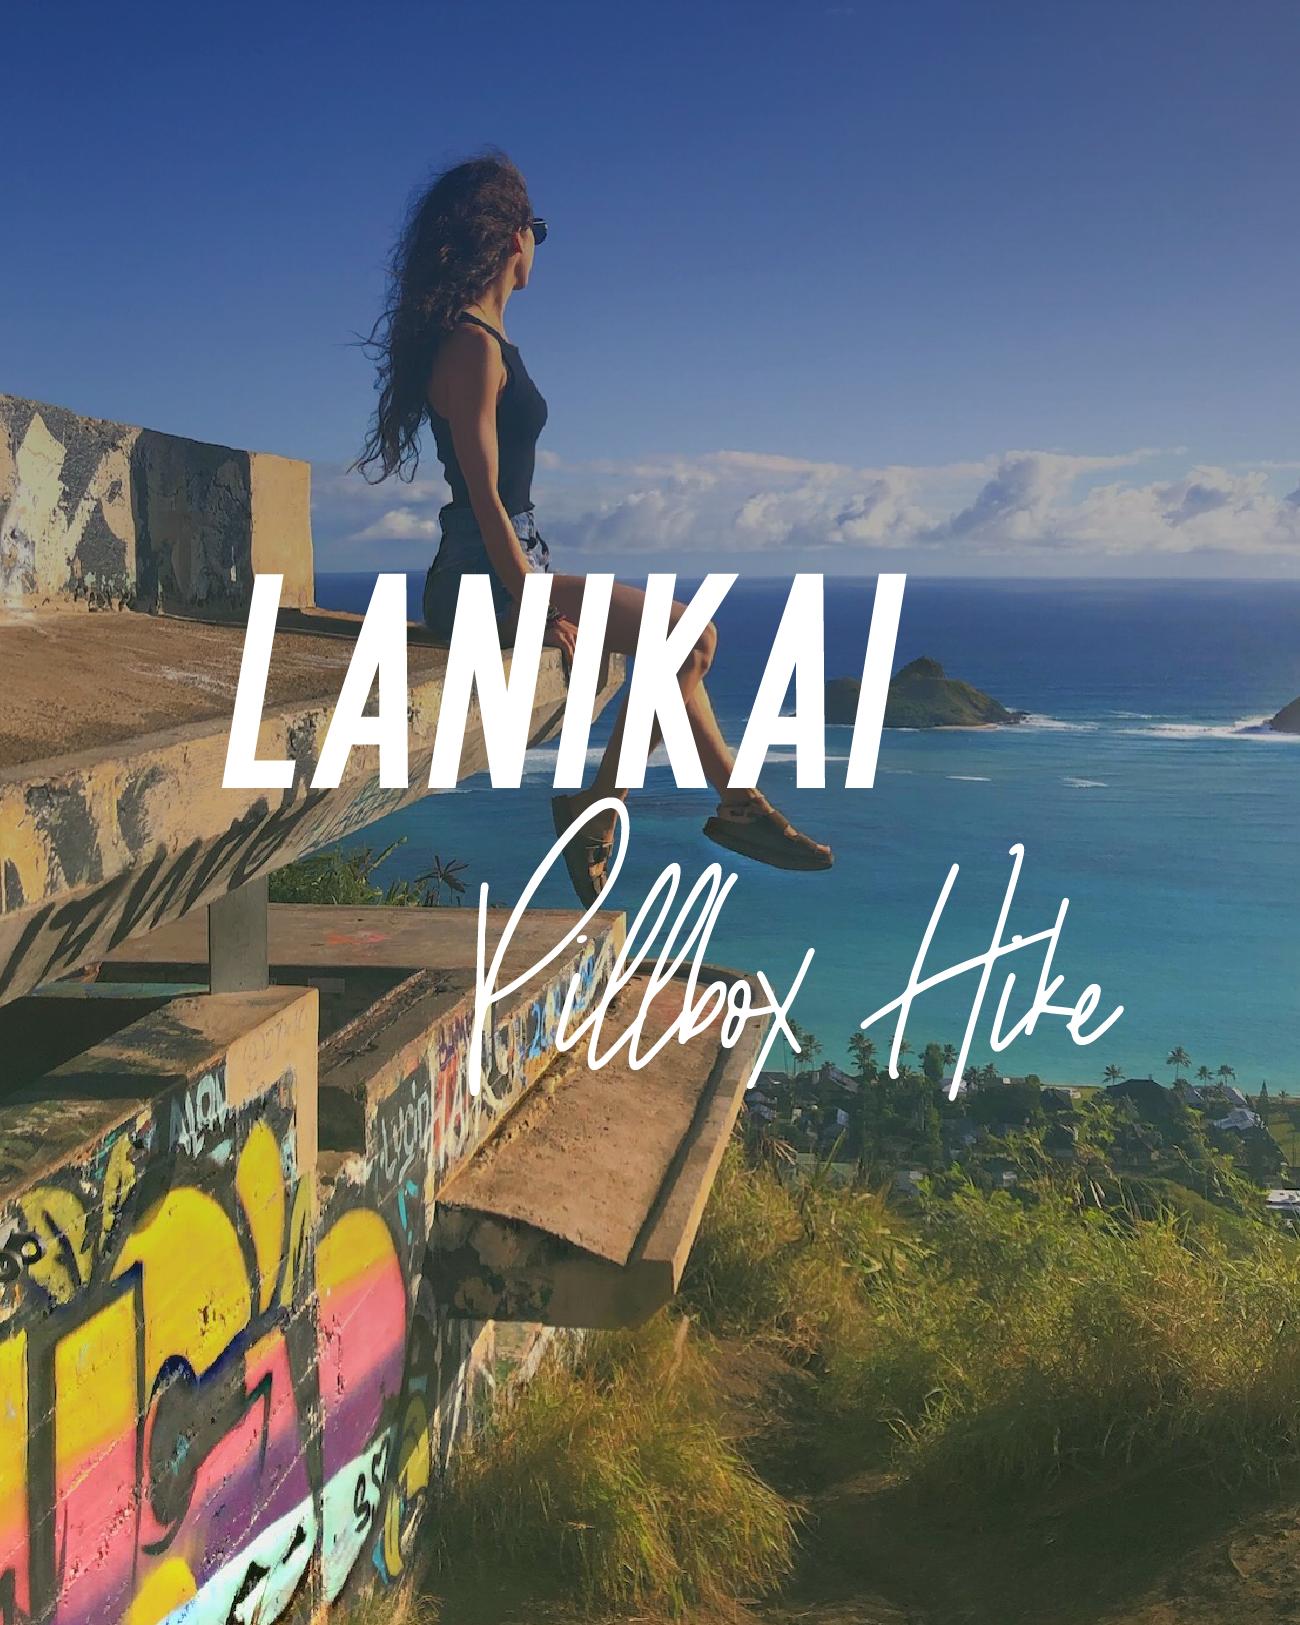 hello-adventure-co-Lanikai-Pillbox-Hike.png